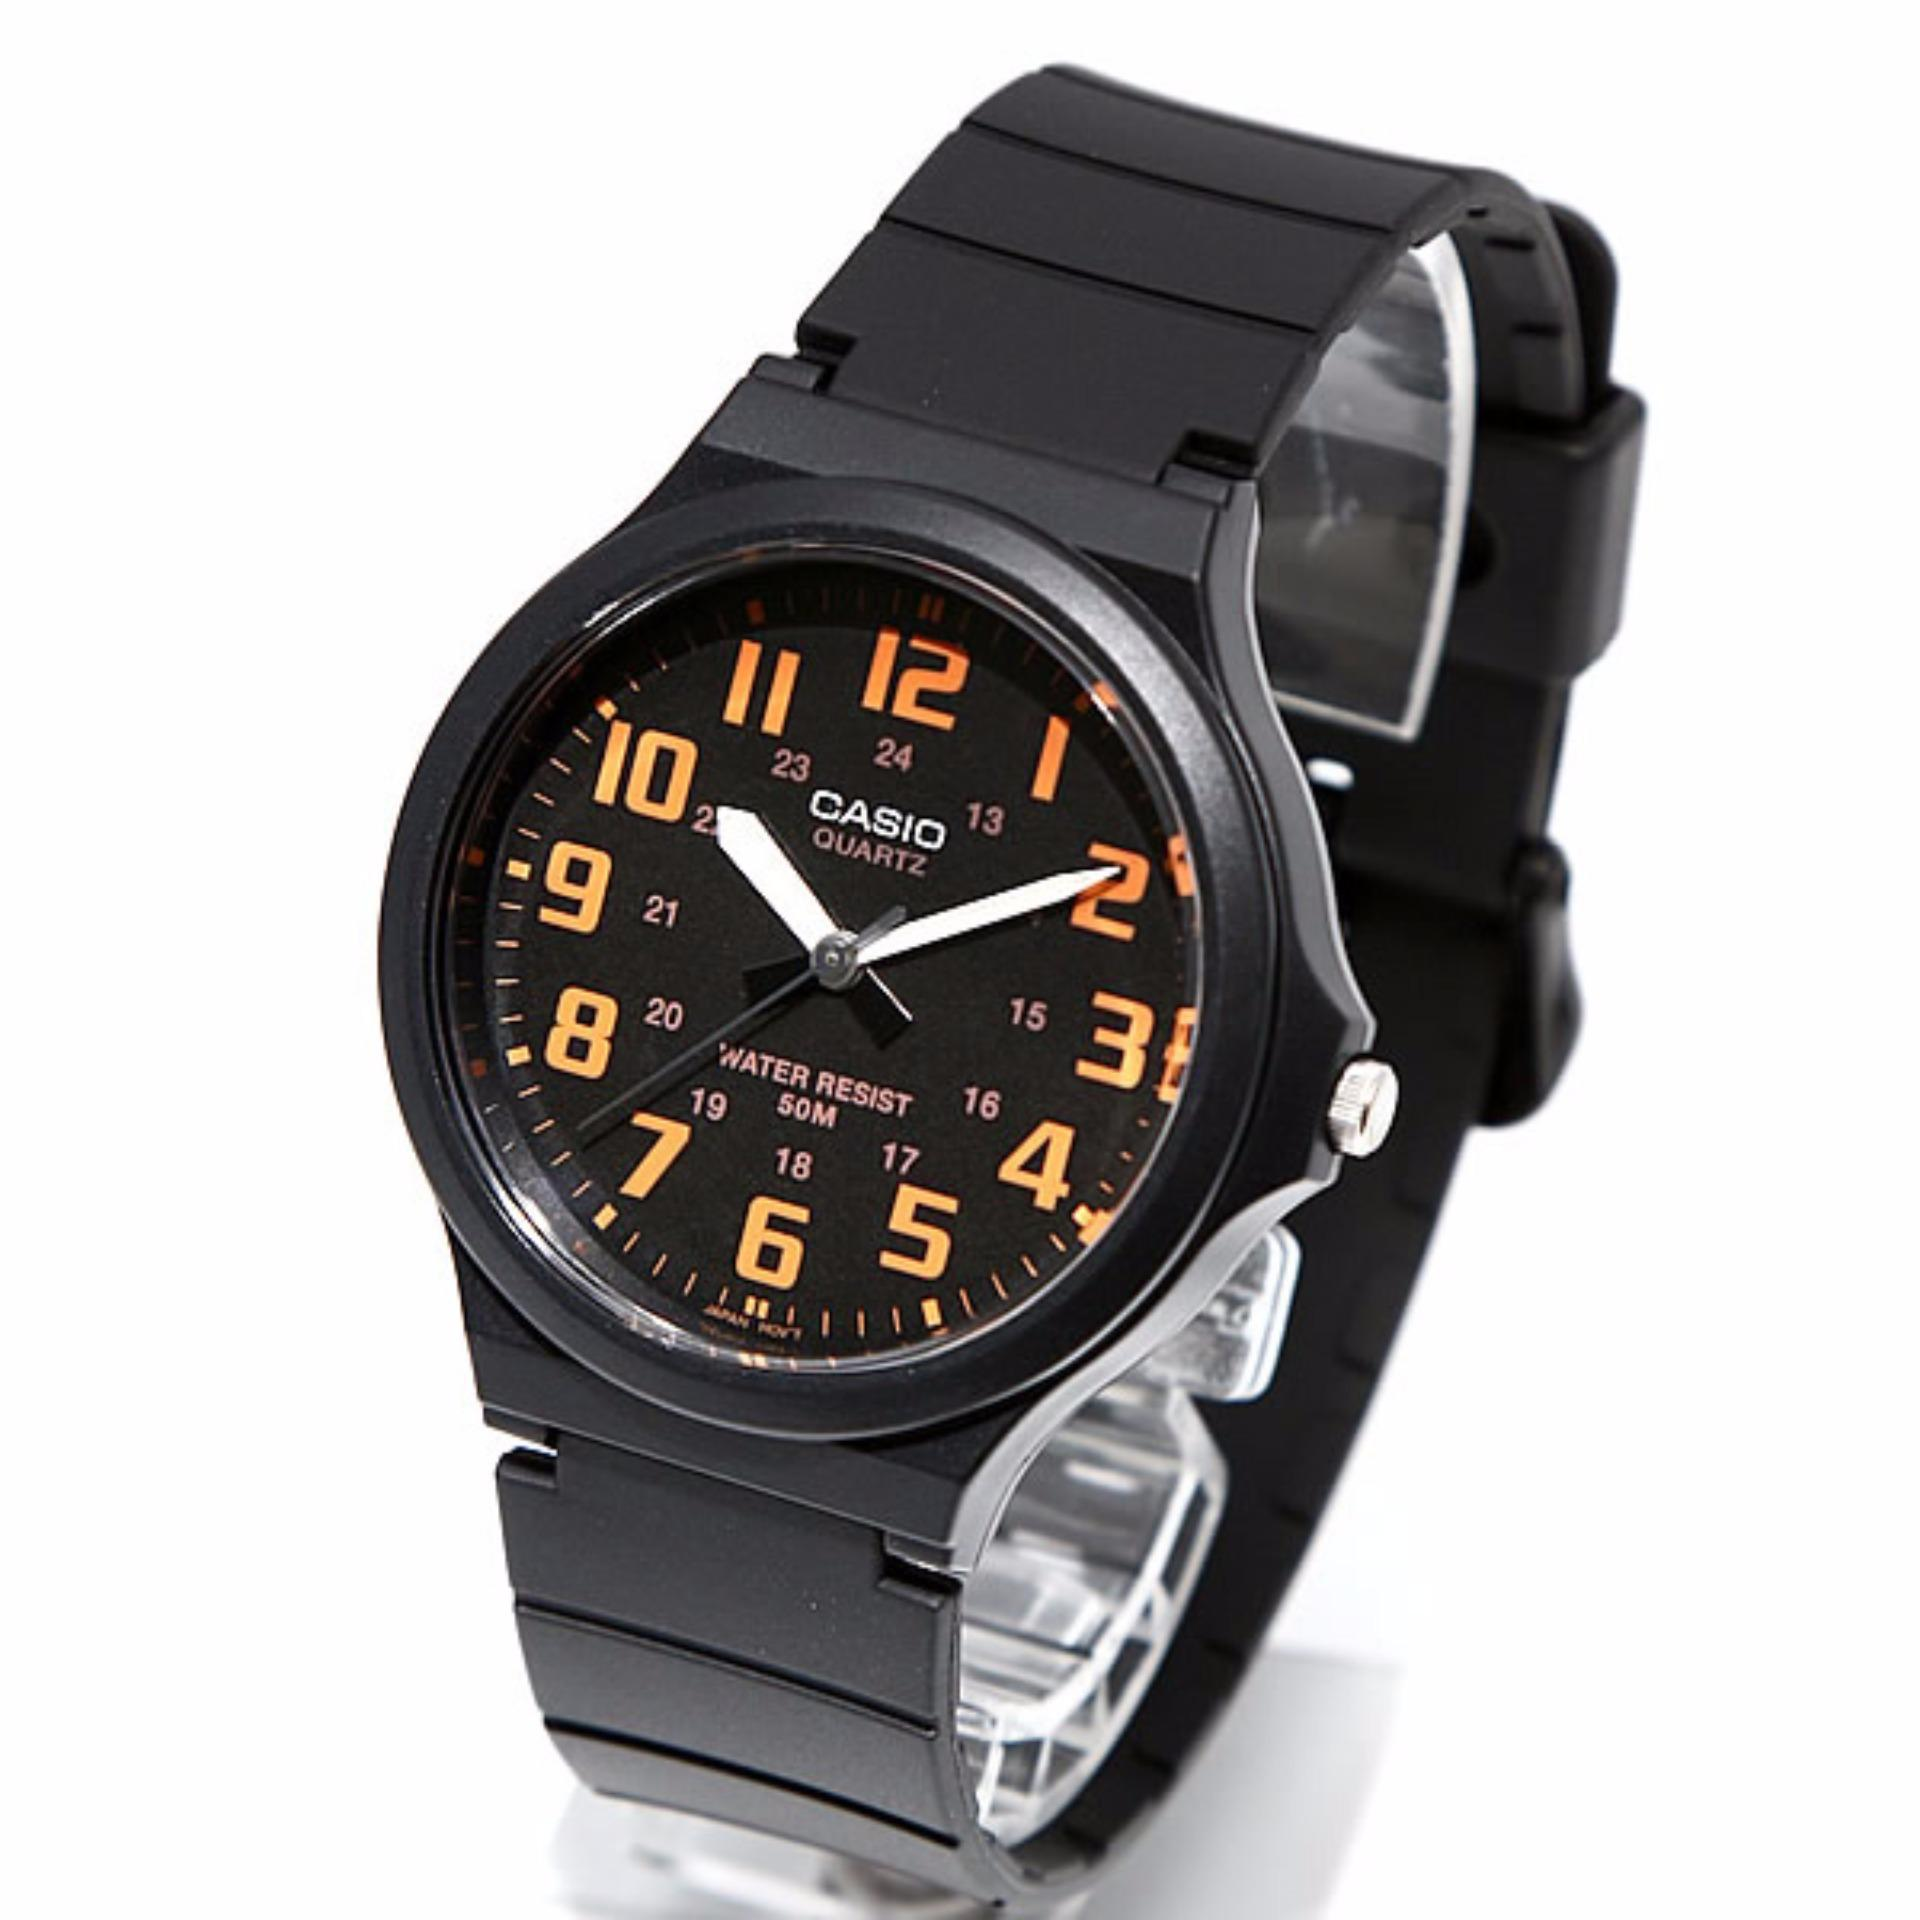 Casio Mw 240 4bvdf Jam Tangan Pria Hitam Orange Karet Spec Dan Analog And Digital Watch Aq S810w 3av Strap Rubber Hijau